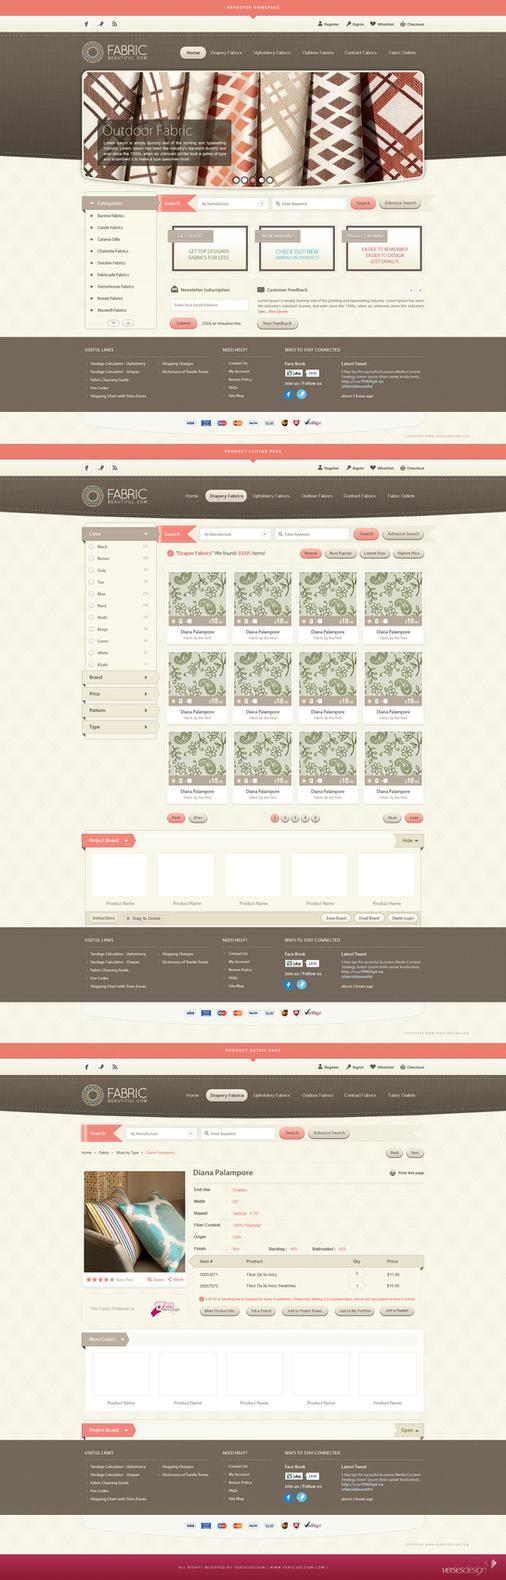 Fabric Beautiful Full Website by waseemarshad